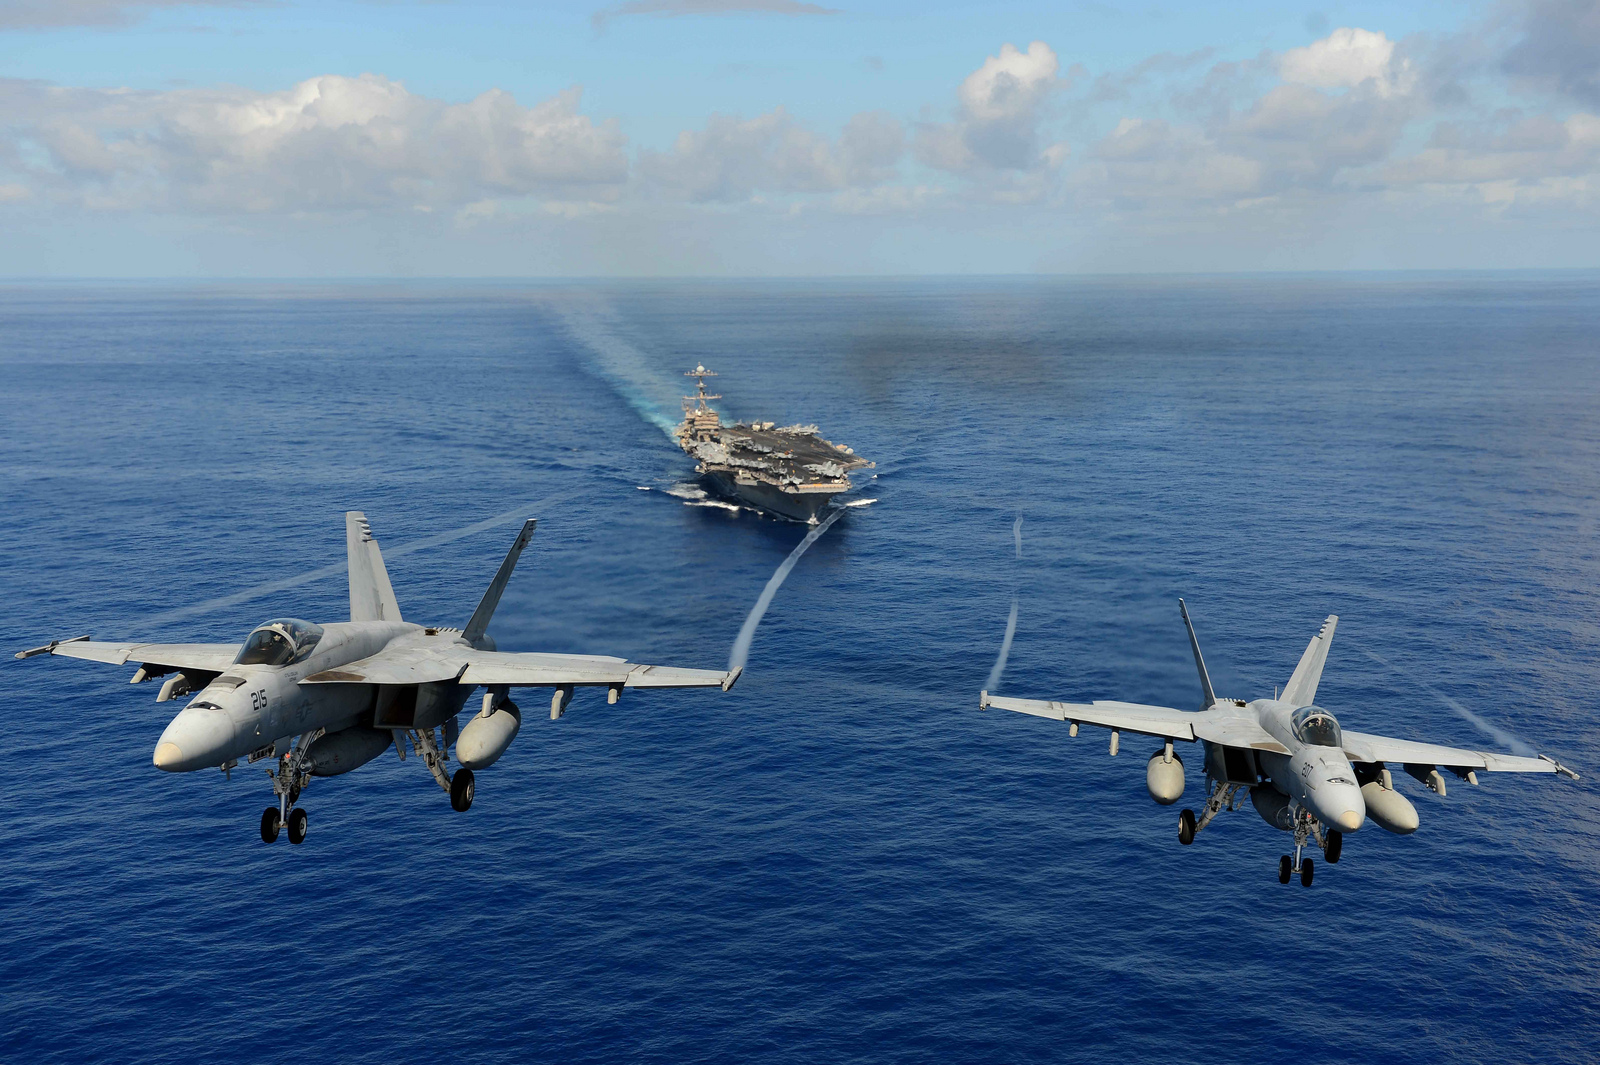 http://theaviationist.com/wp-content/uploads/2013/04/F-18E-VFA-14.jpg